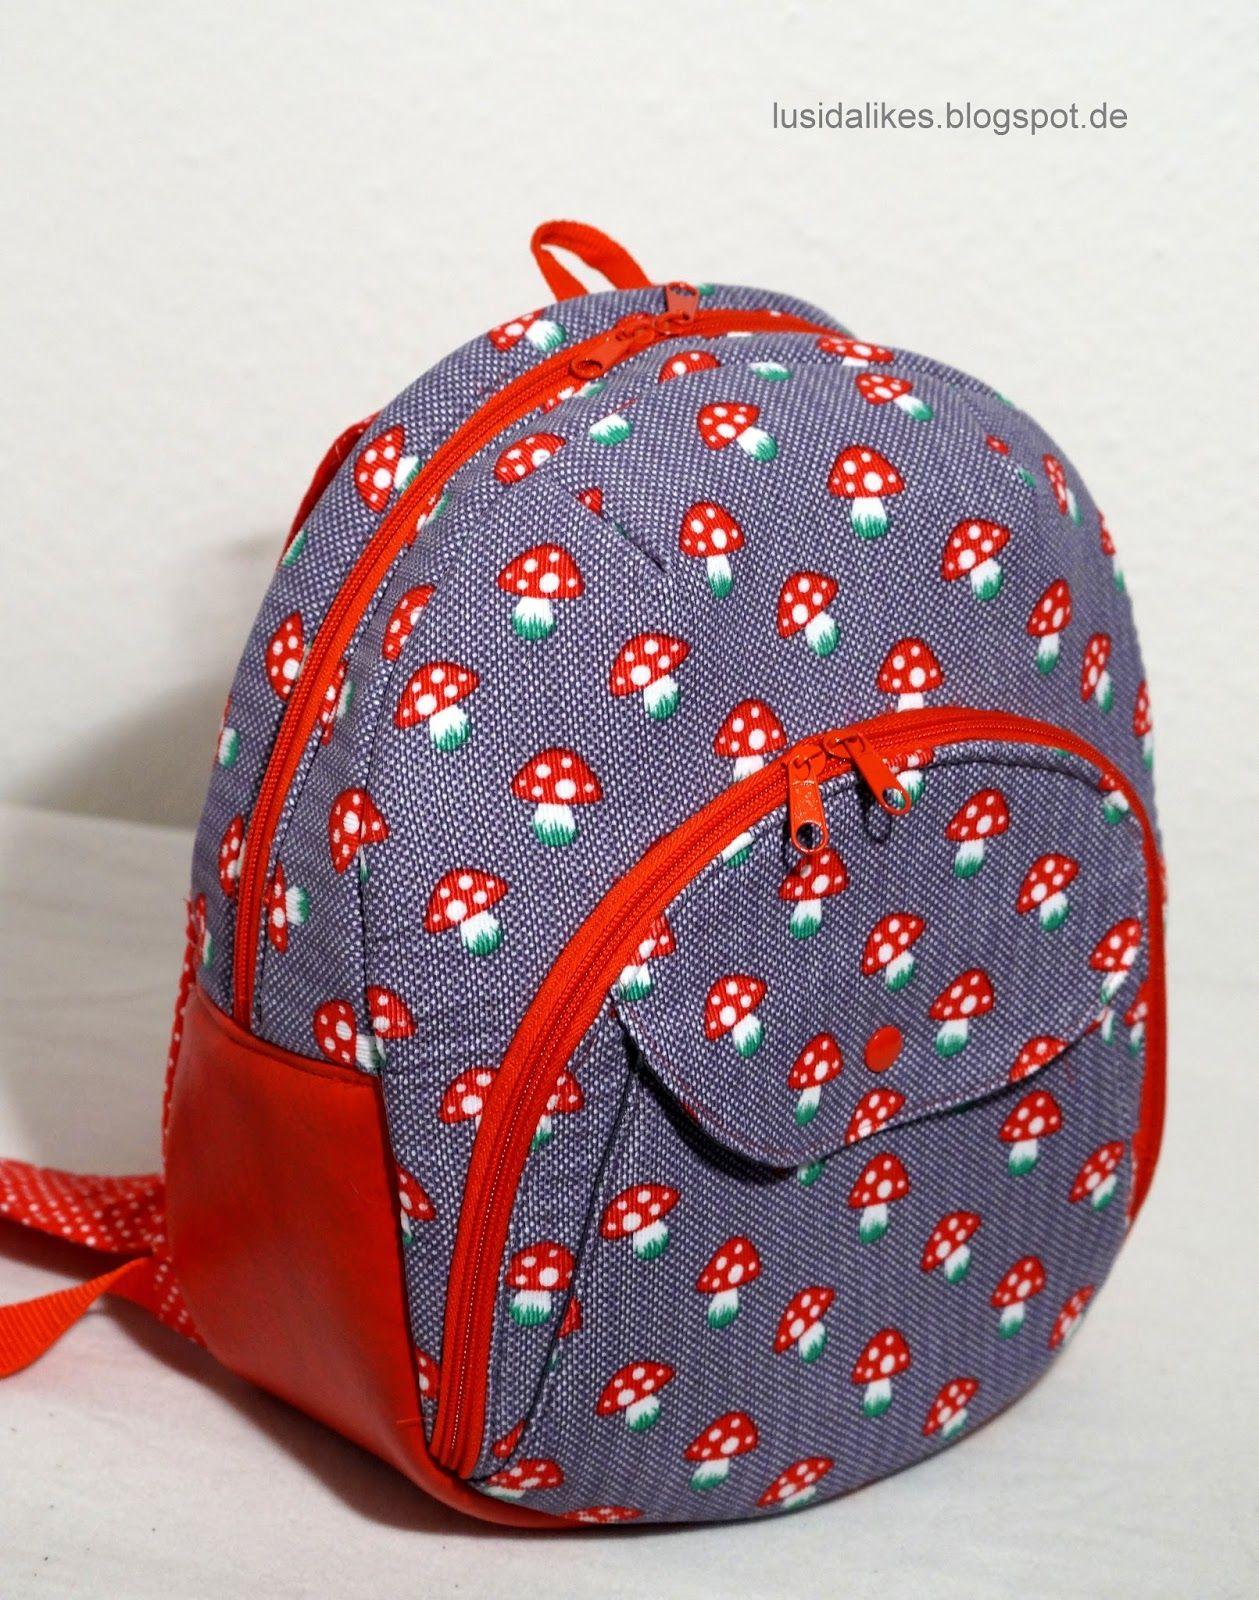 Sew Sweetness Cumberland Backpack sewing pattern | Sew Sweetness ...